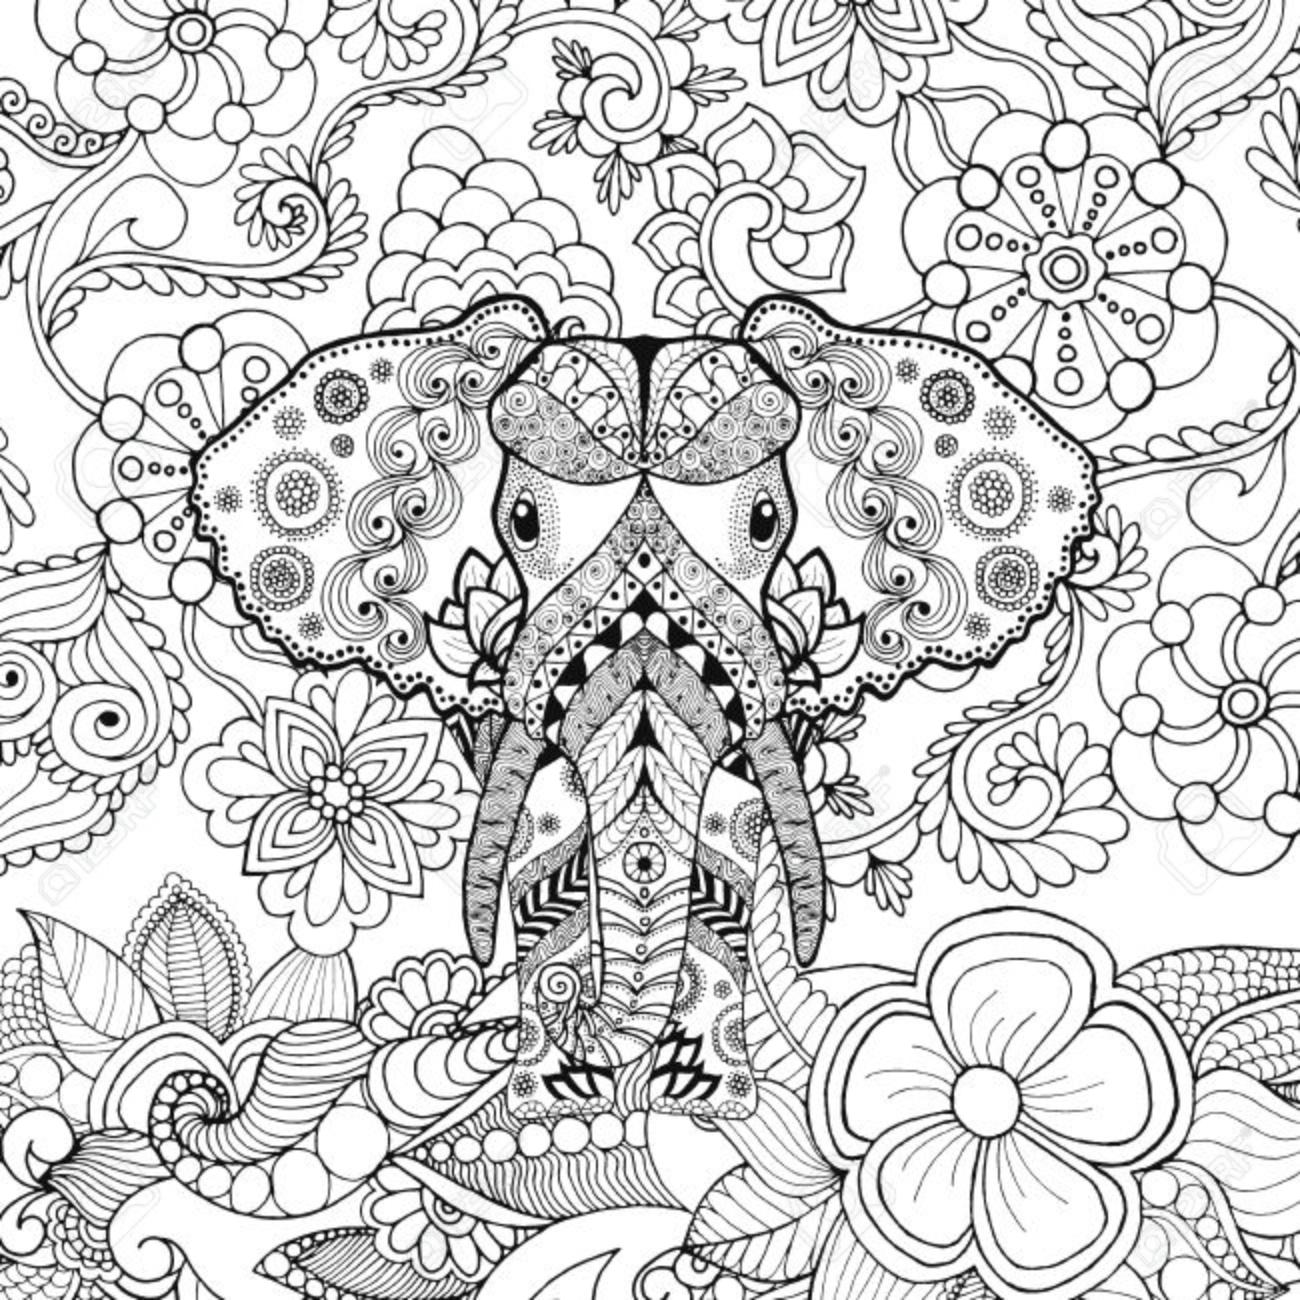 1300x1300 Cute Elephant In Flower Garden. Animals. Hand Drawn Doodle. Ethnic